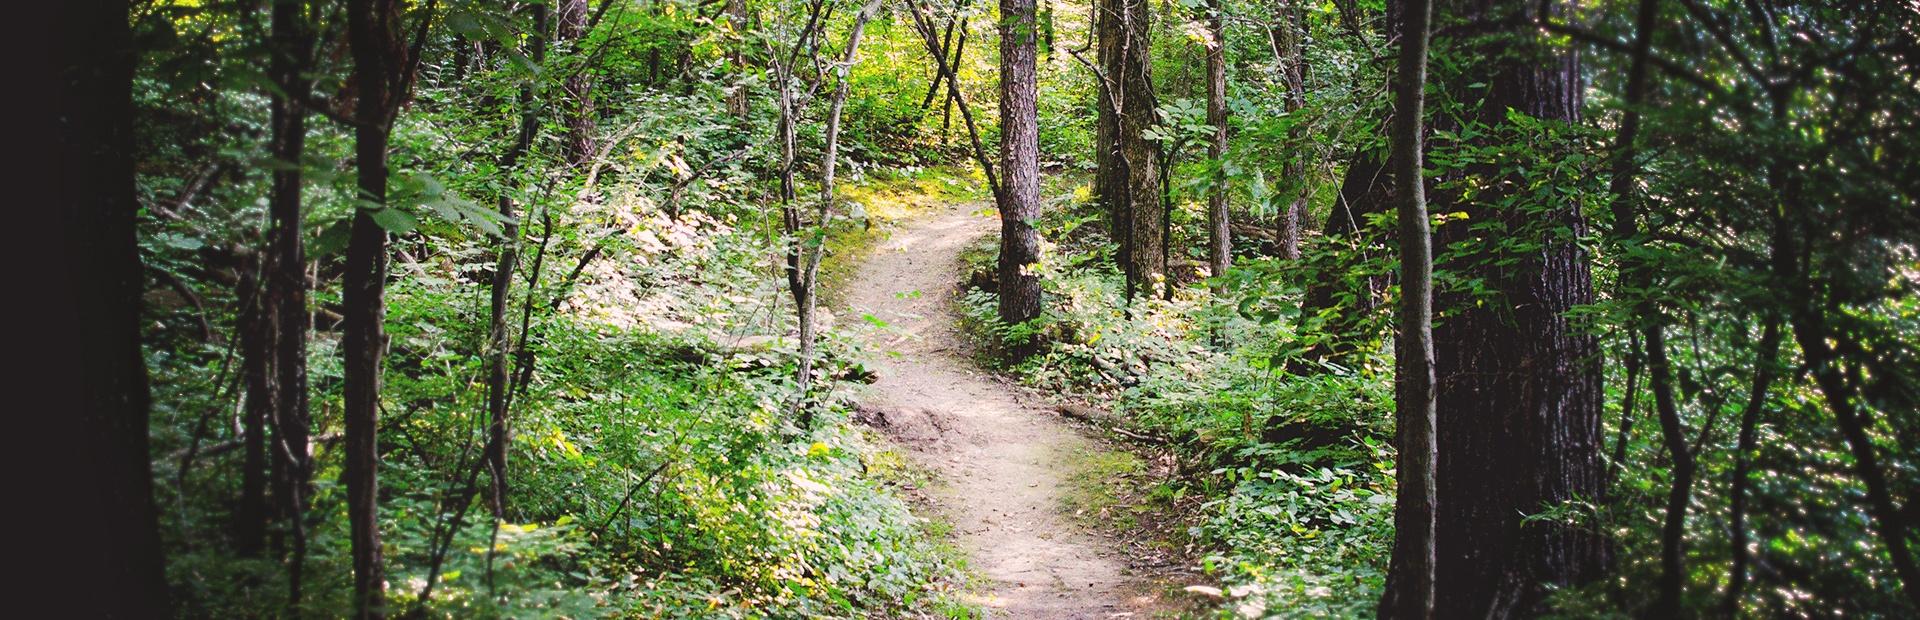 Slider Clearing a Trail.jpg